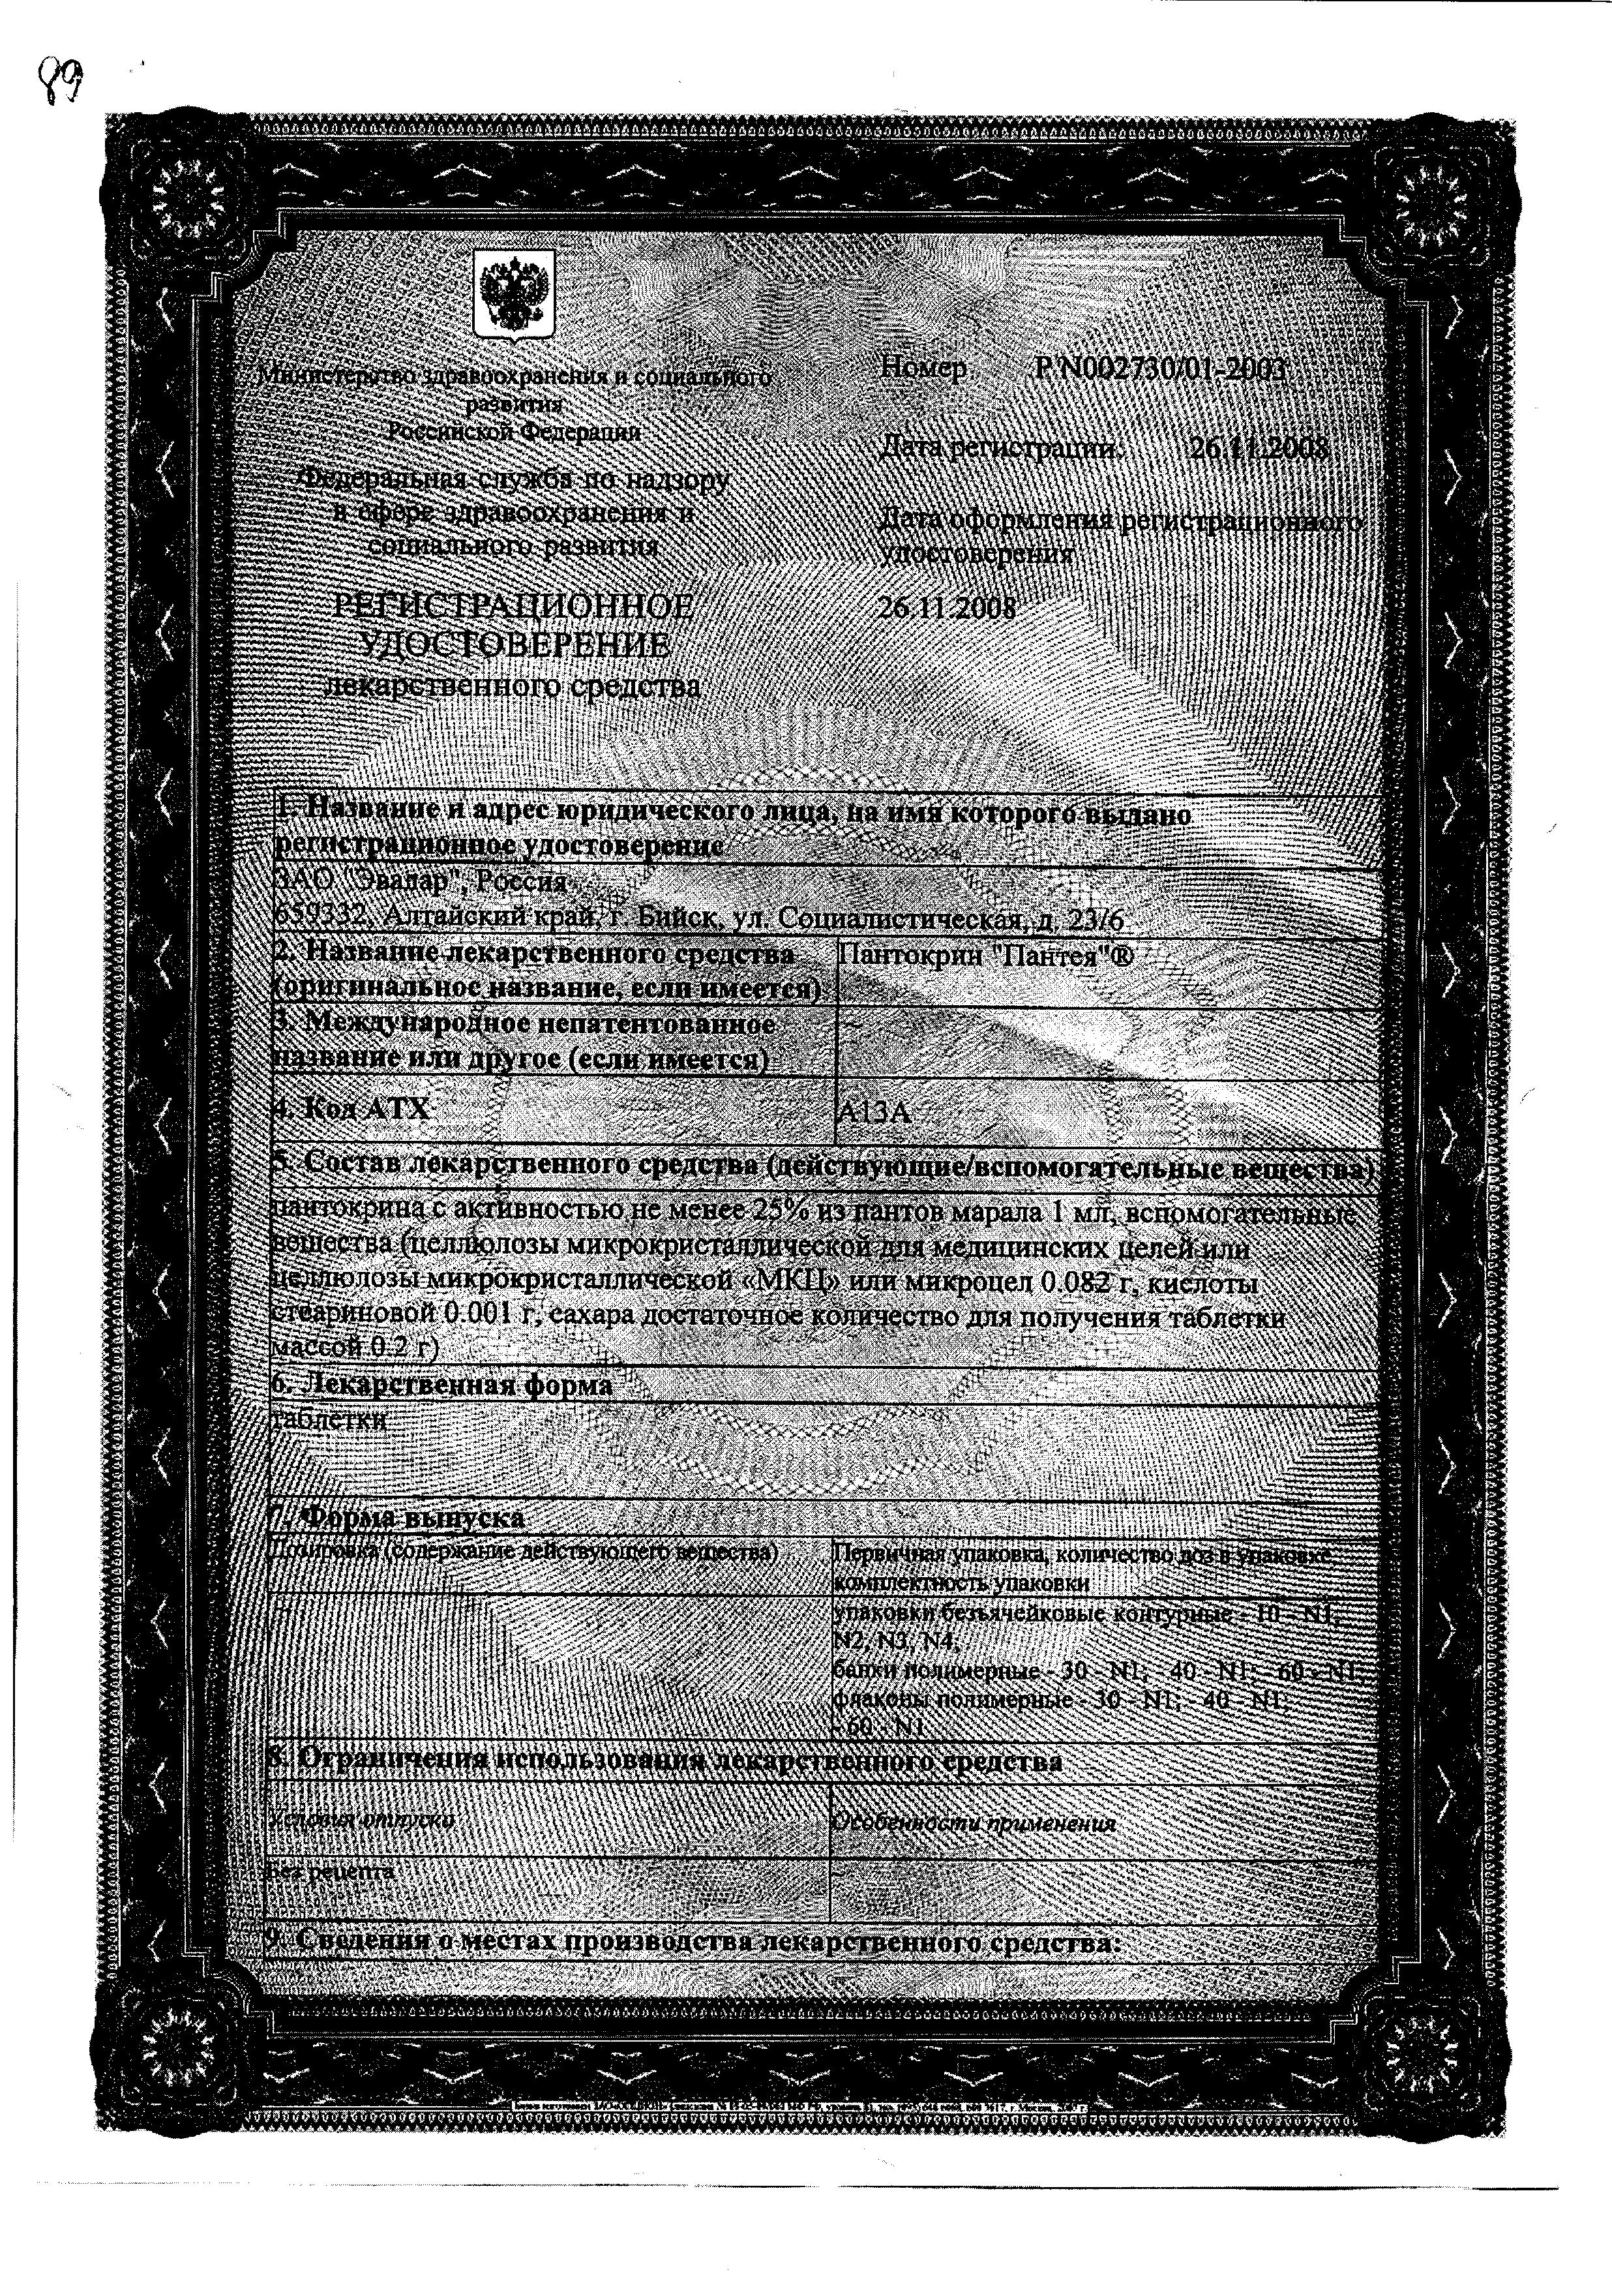 Пантокрин Пантея (БАД) сертификат